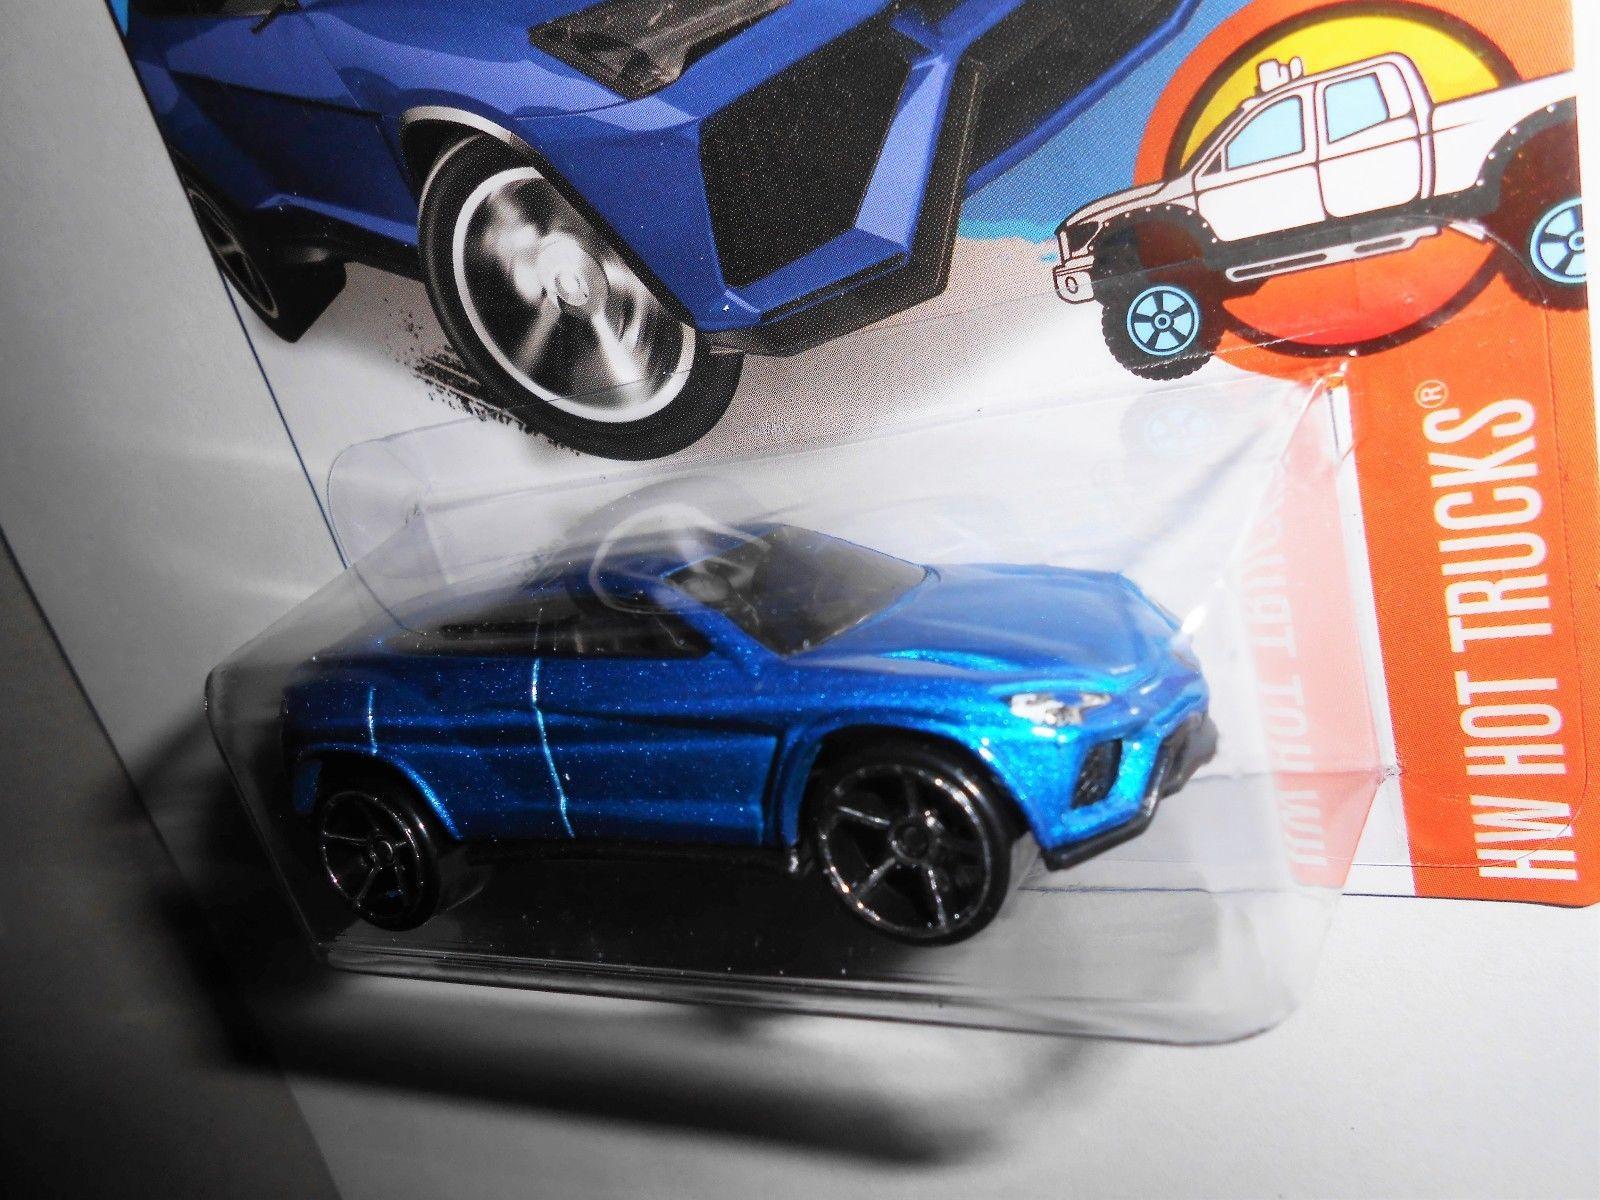 Amazing Hot Wheels Lamborghini Urus Hot Trucks 2 10 Flake Blue